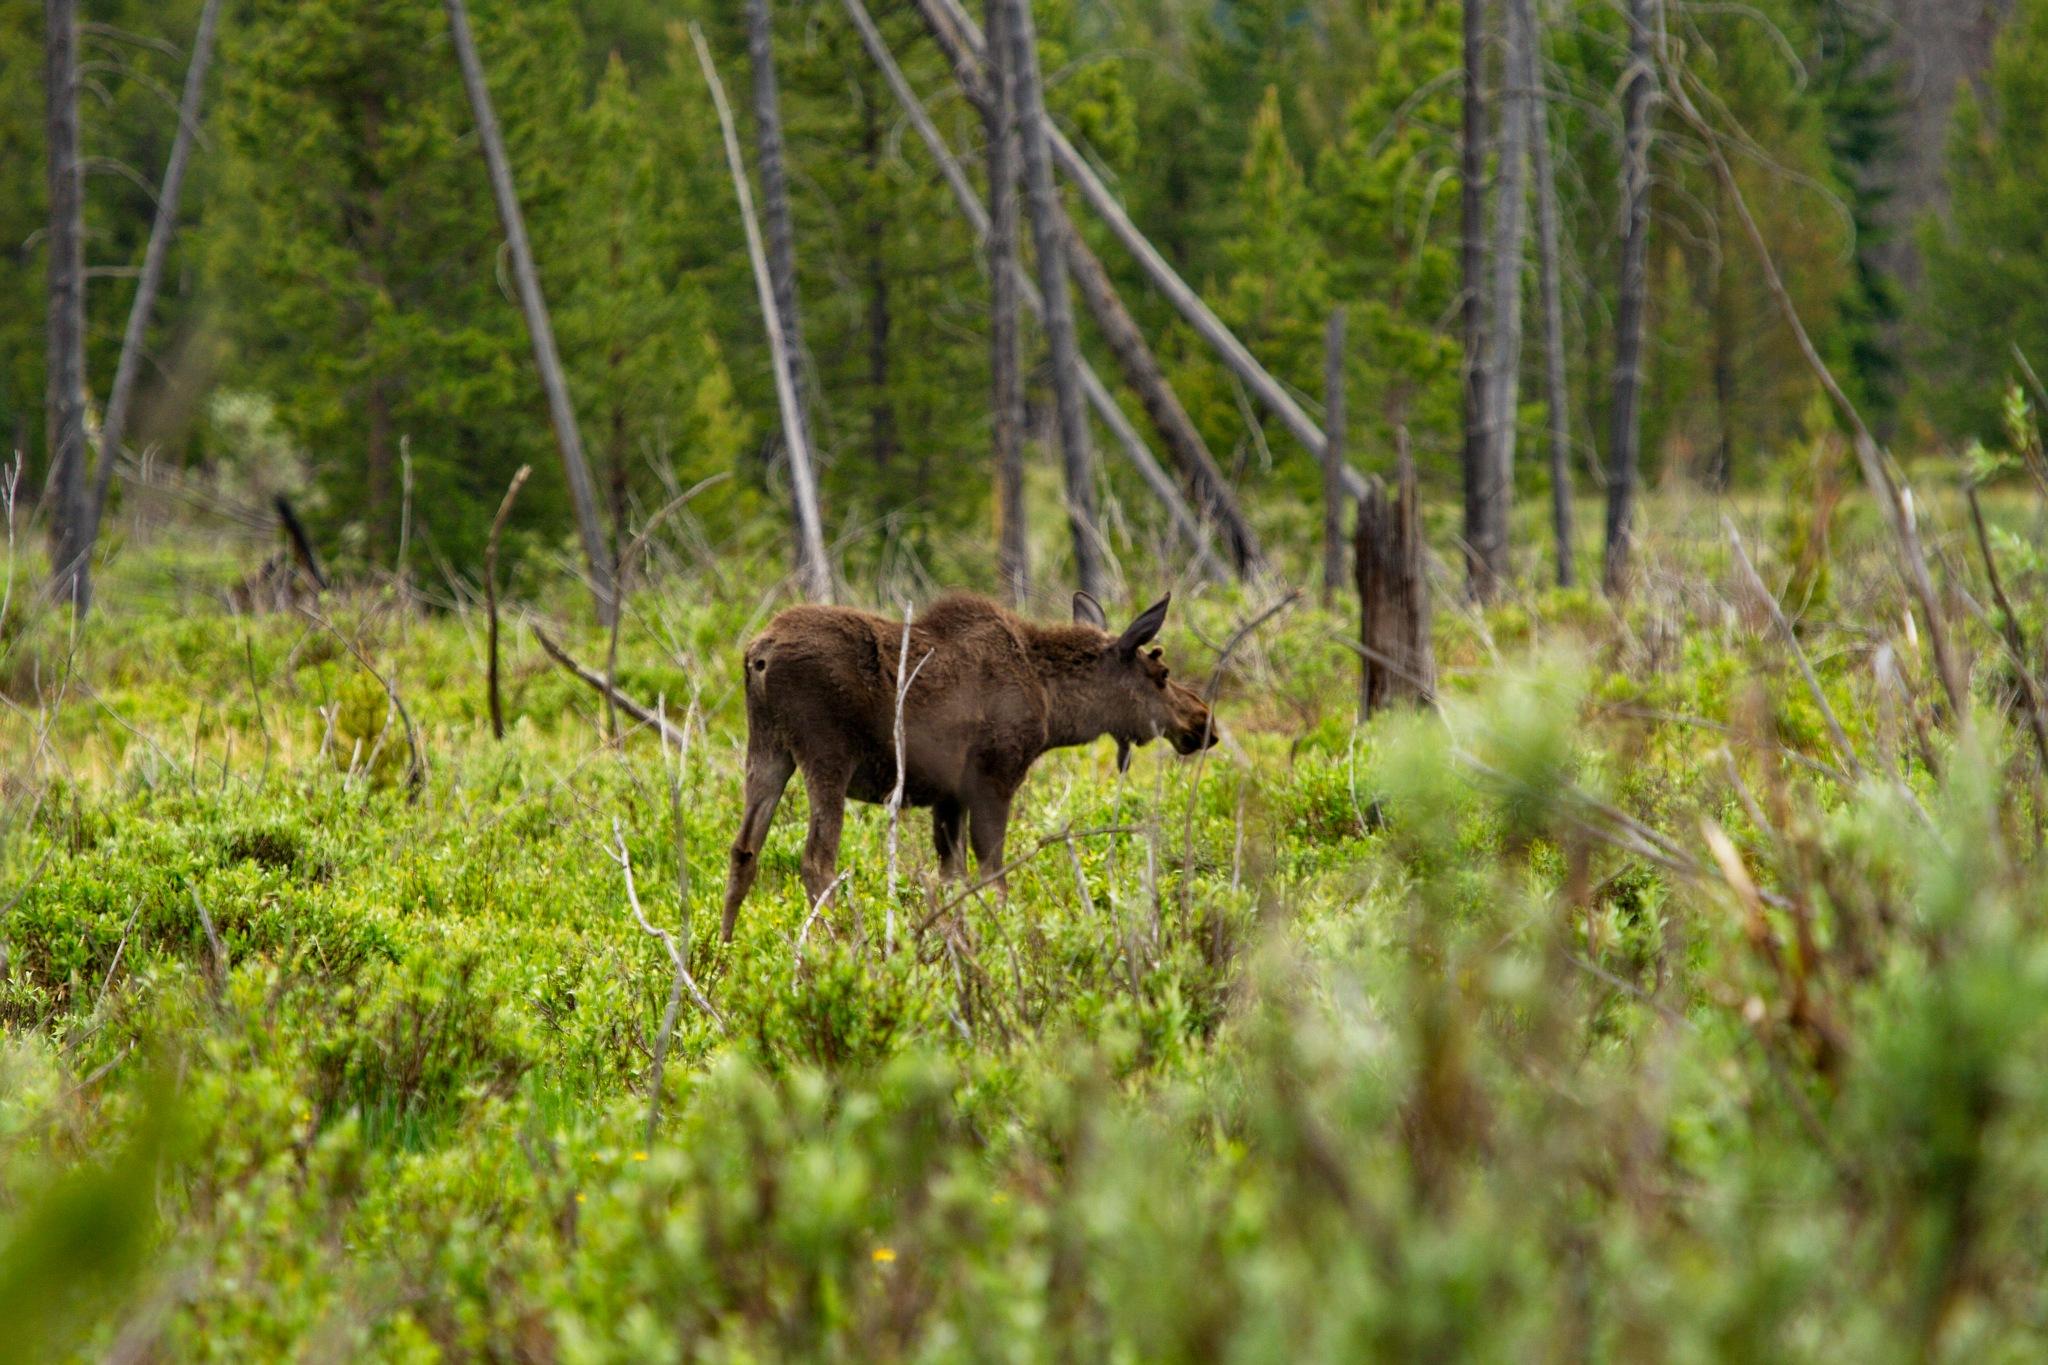 Young Bull Moose by daniel.luna.77920